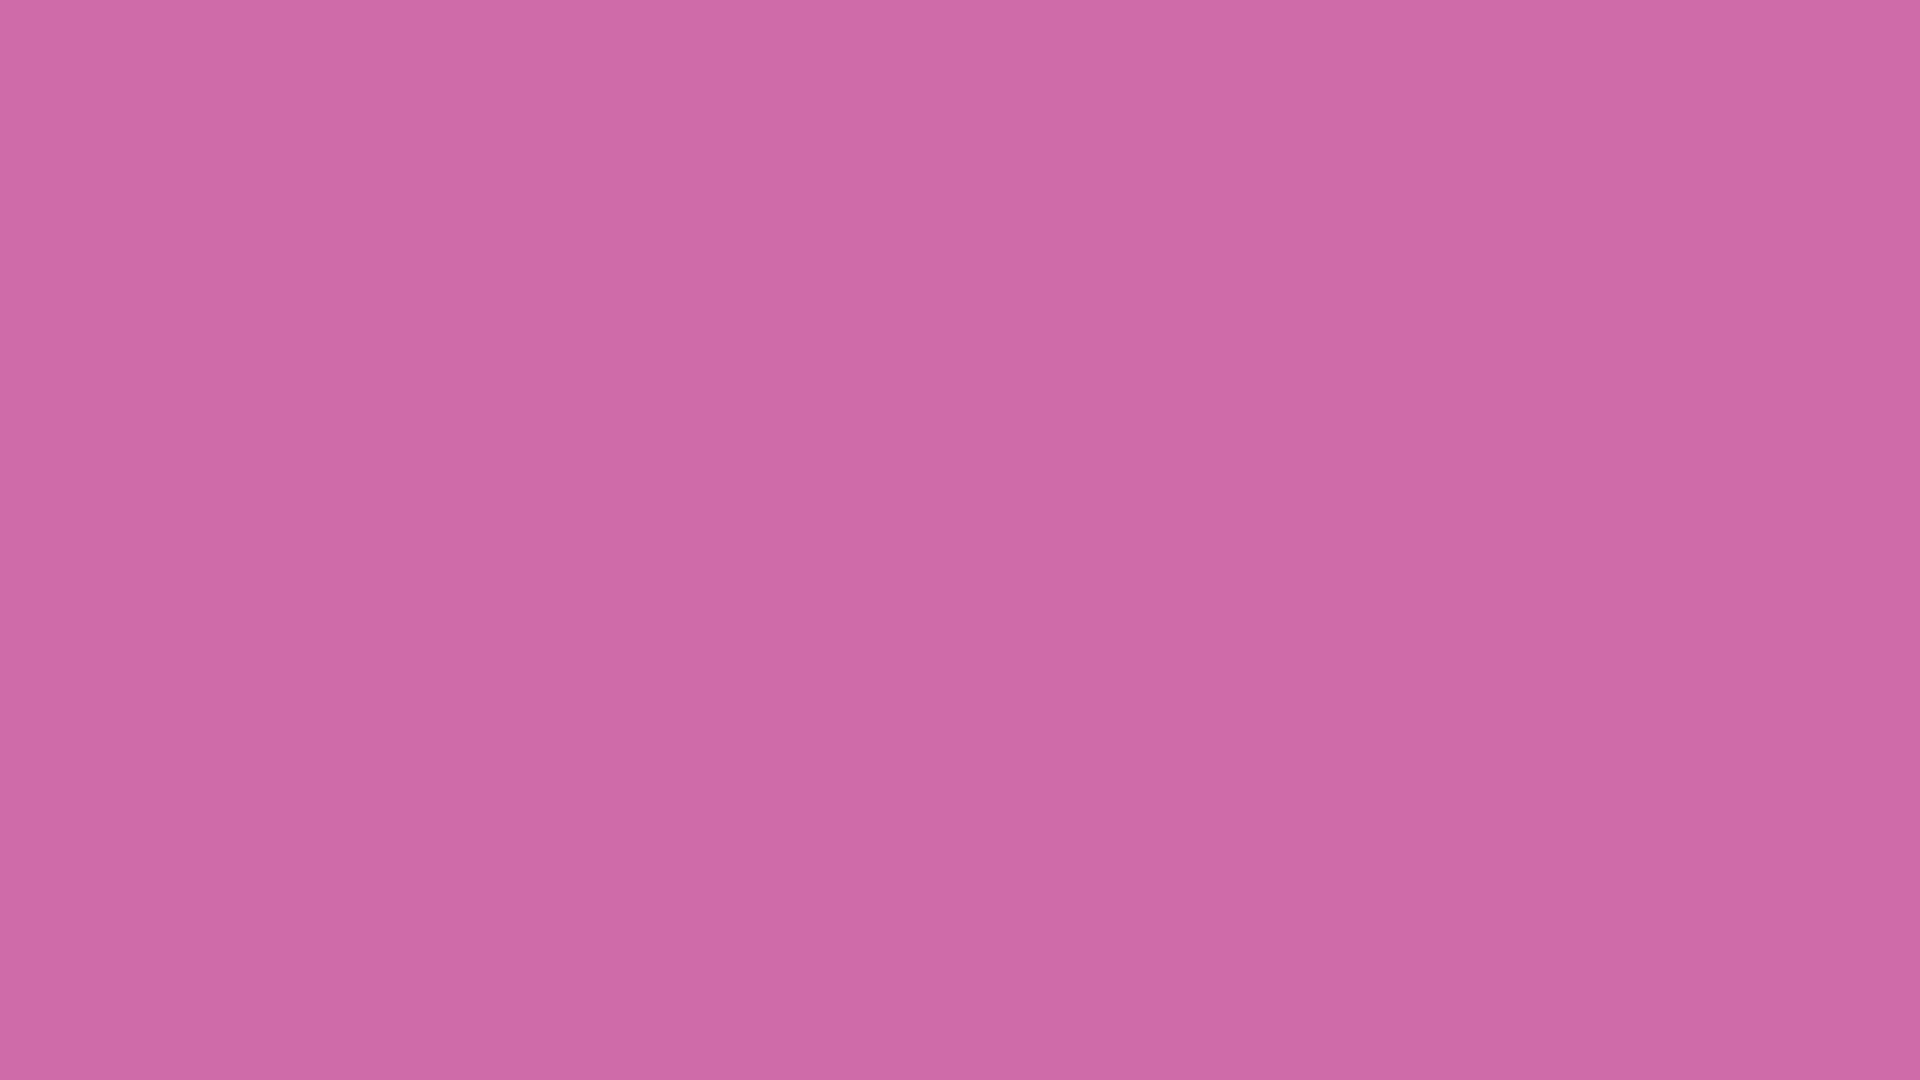 1920x1080 Super Pink Solid Color Background